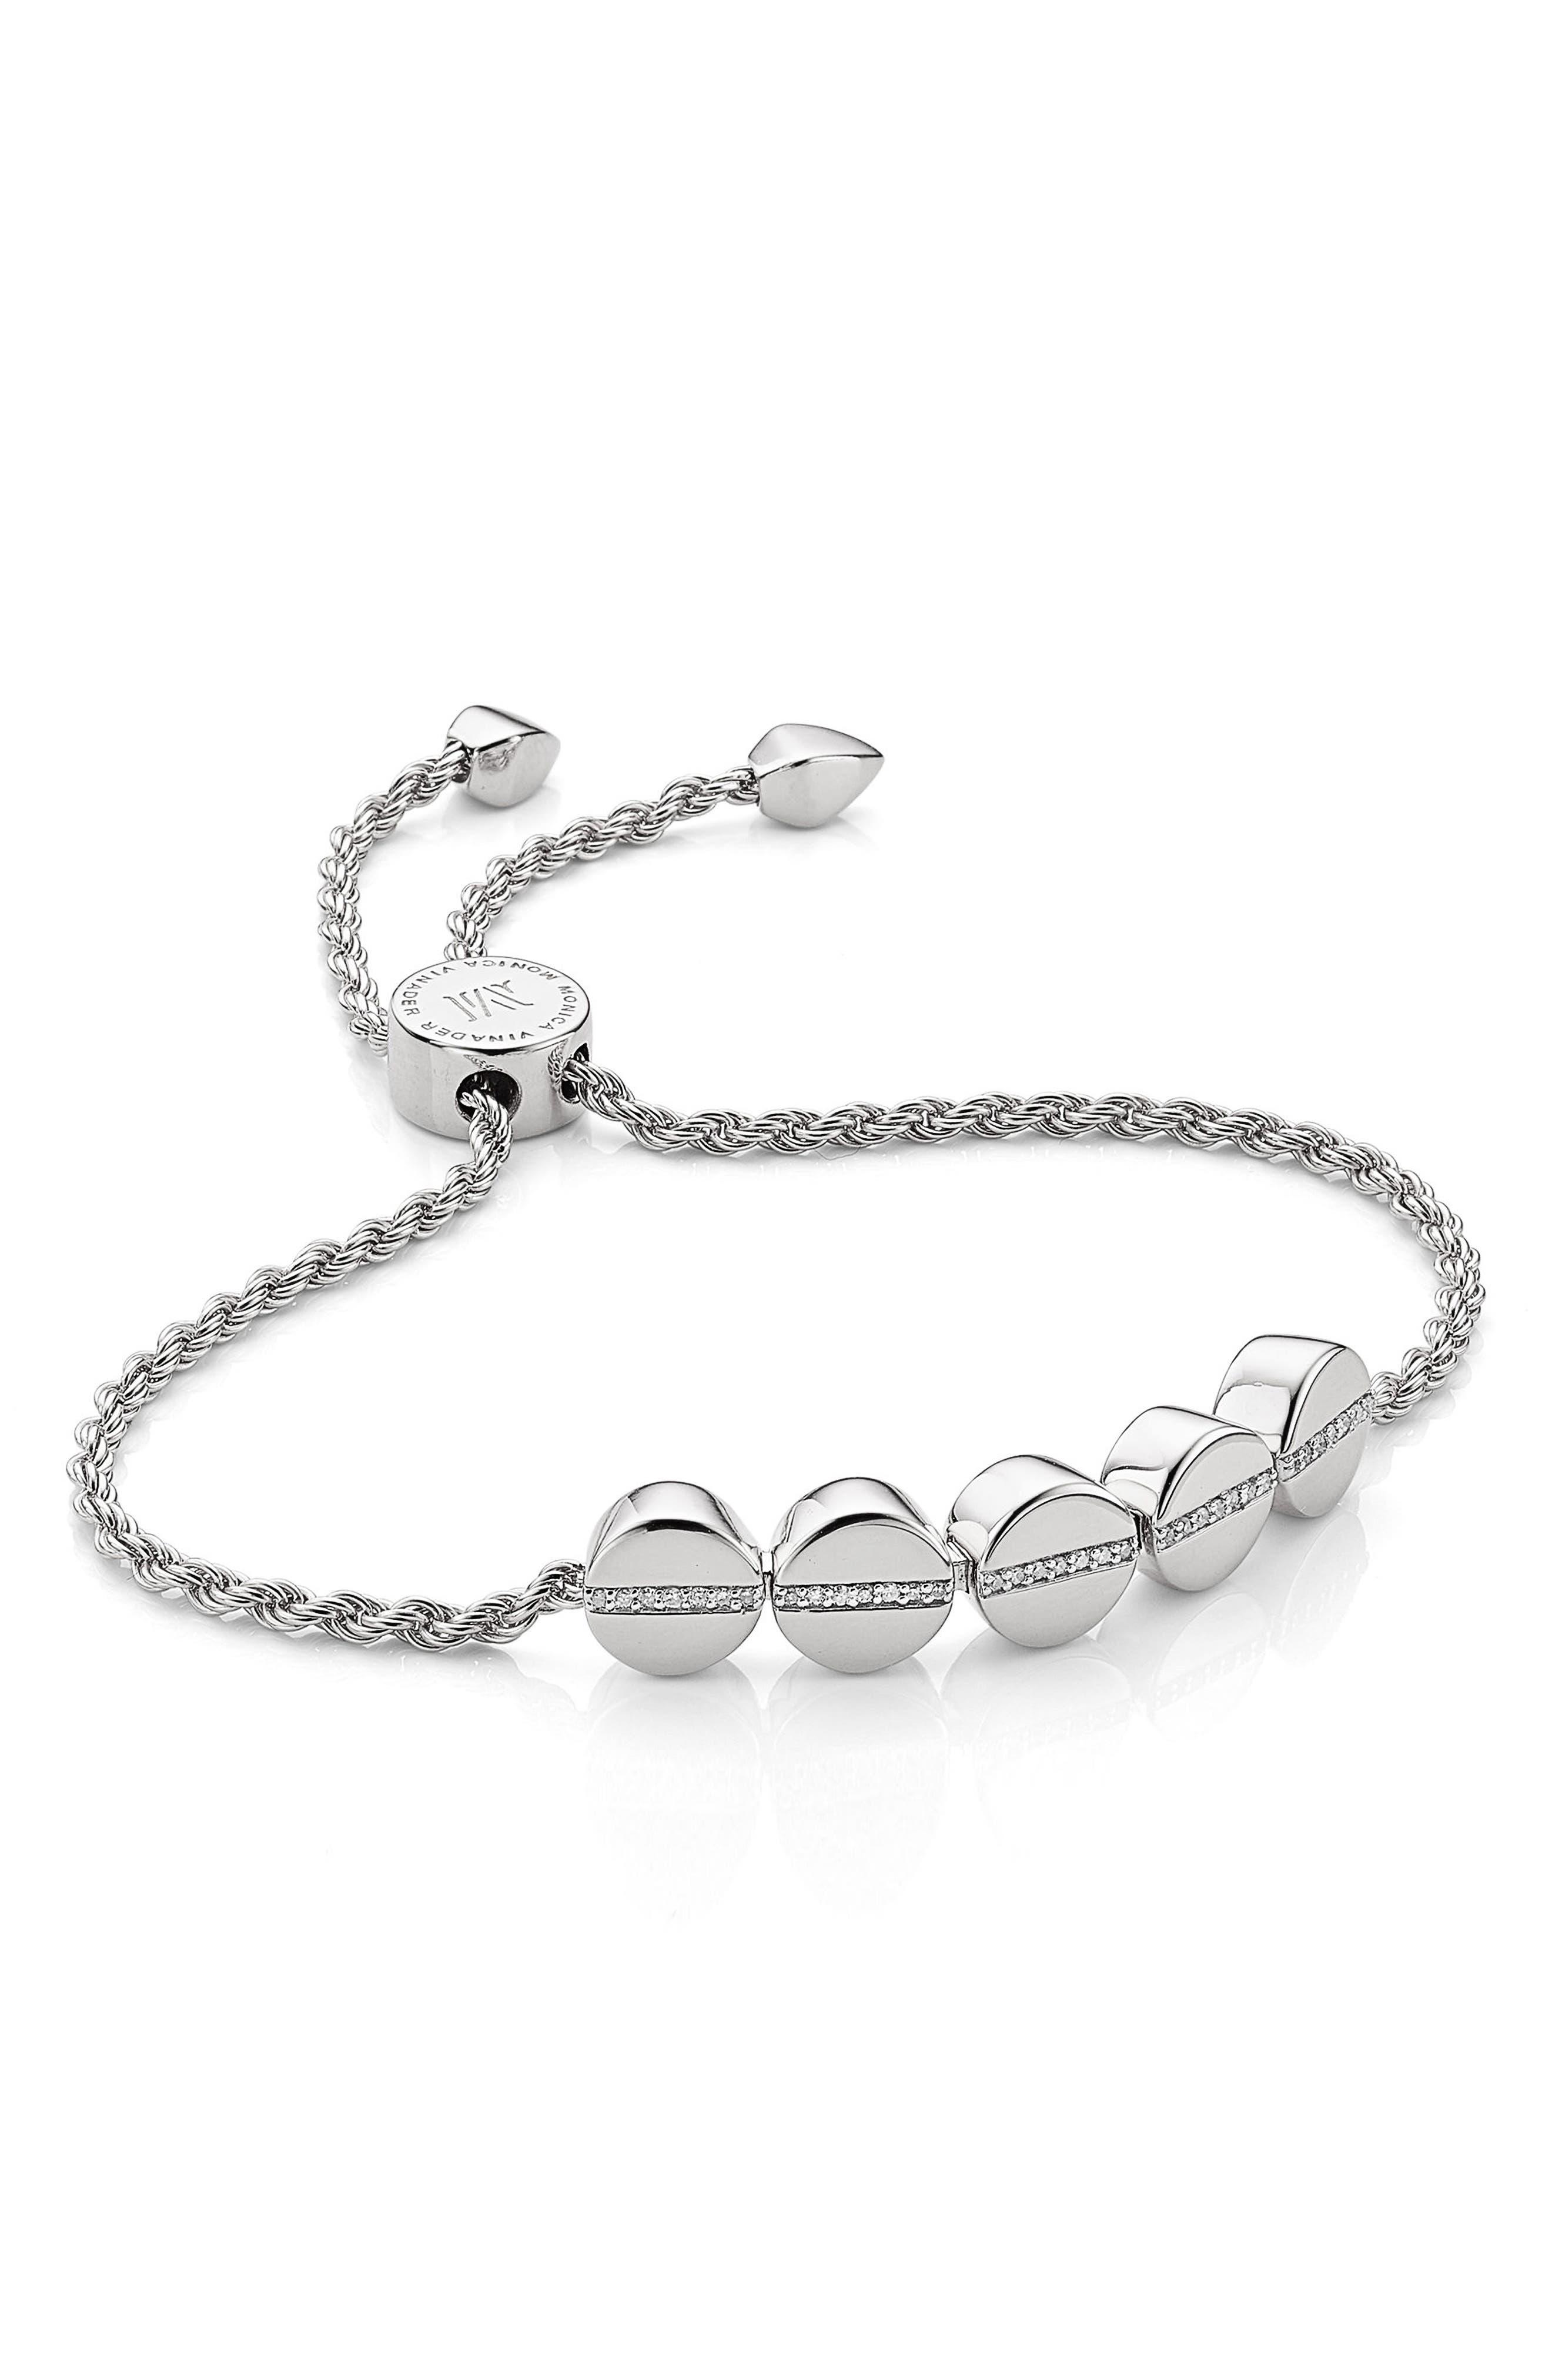 Engravable Diamond Beaded Friendship Bracelet,                             Main thumbnail 1, color,                             SILVER/ DIAMOND